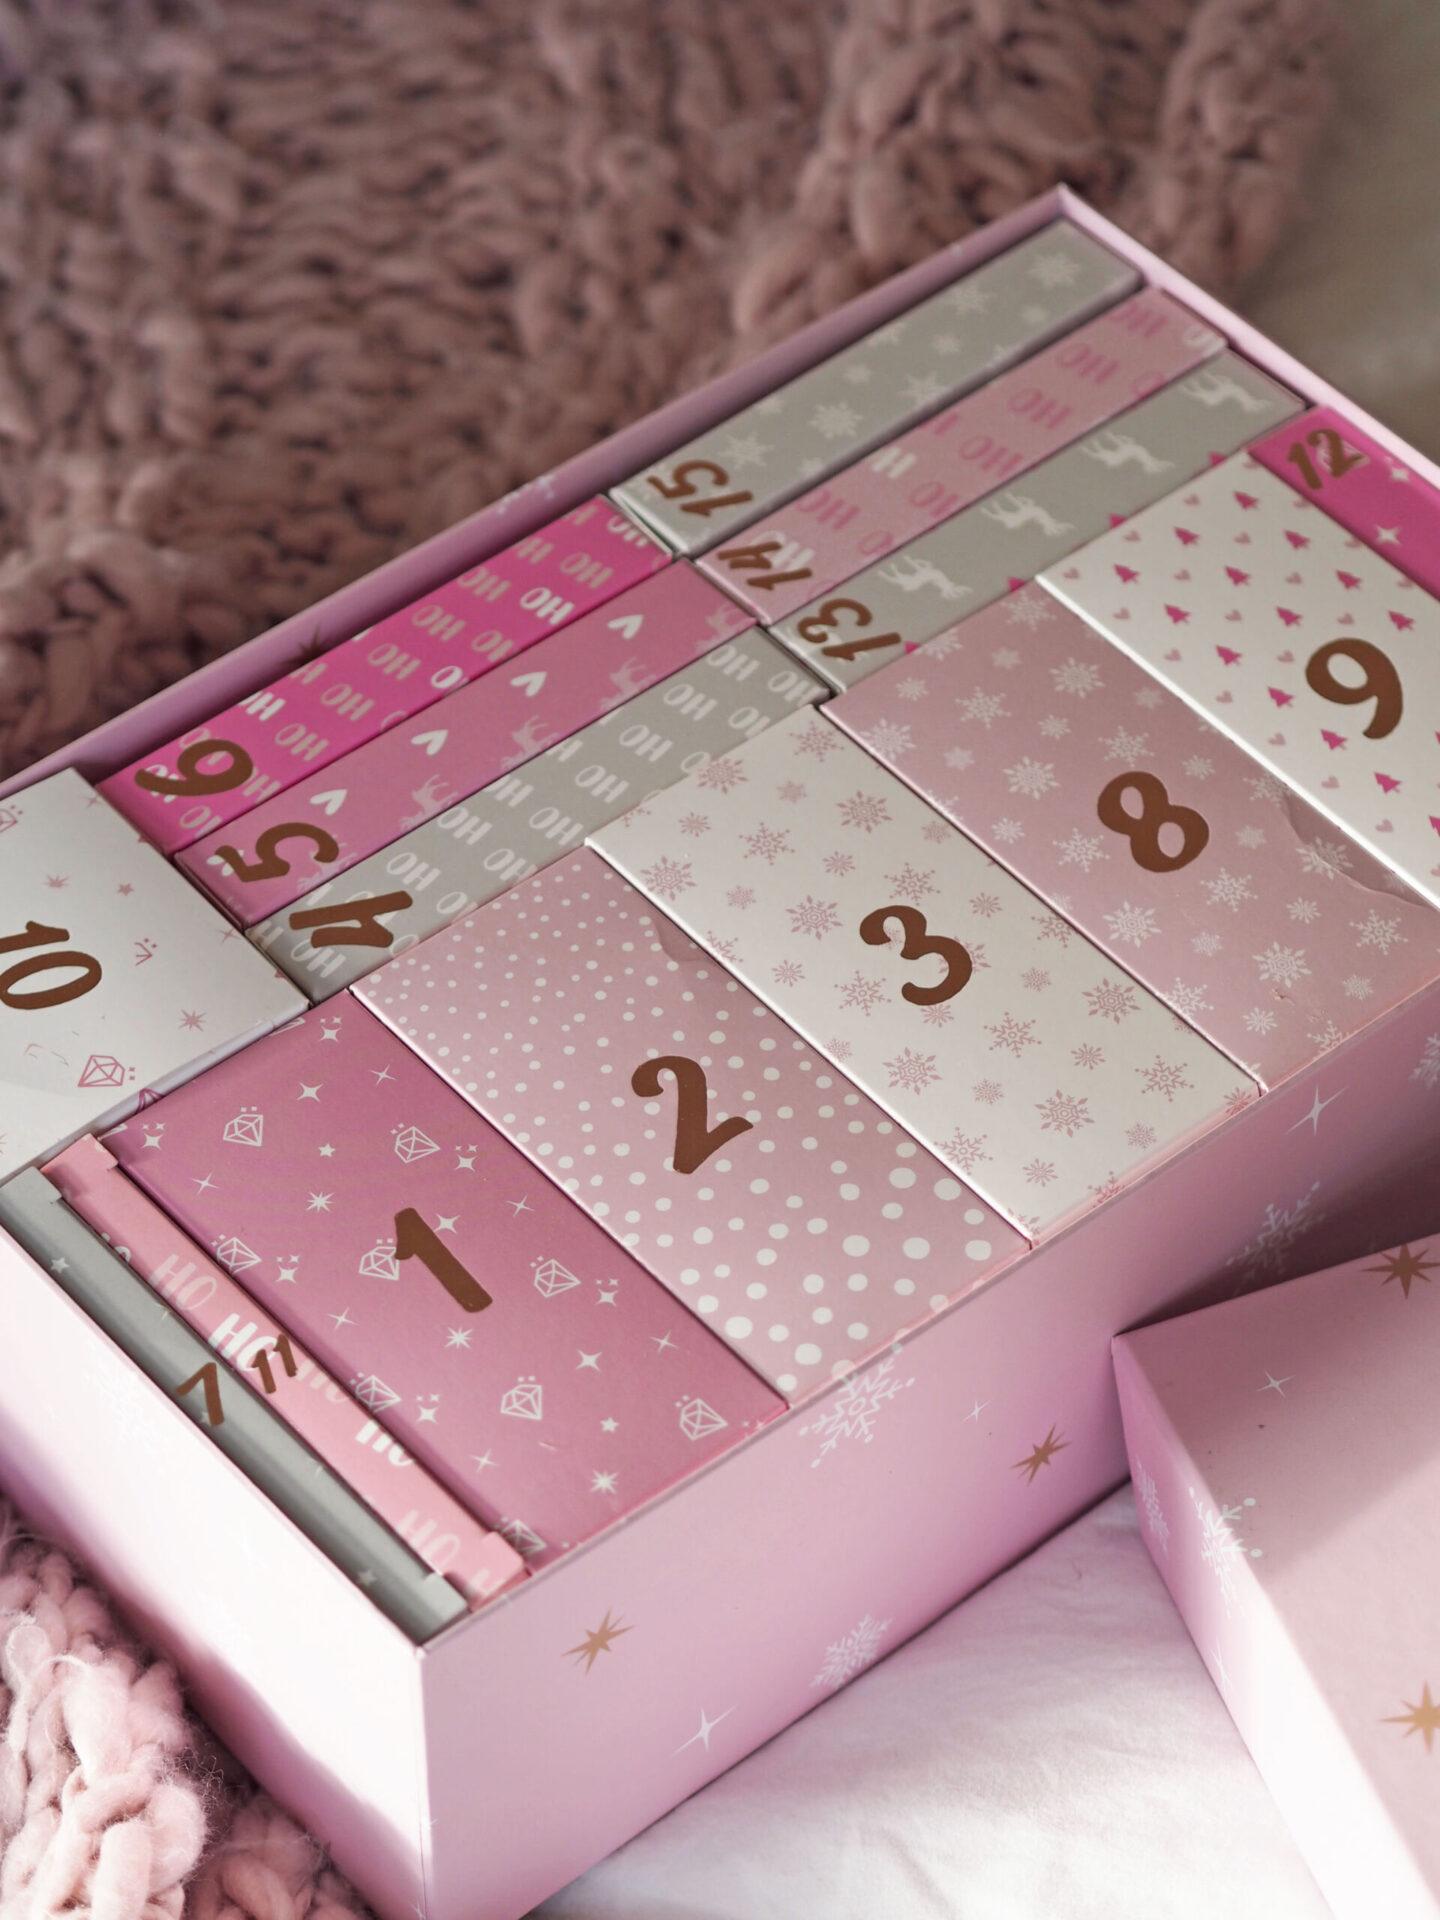 Roccabox beauty advent calendar 2020